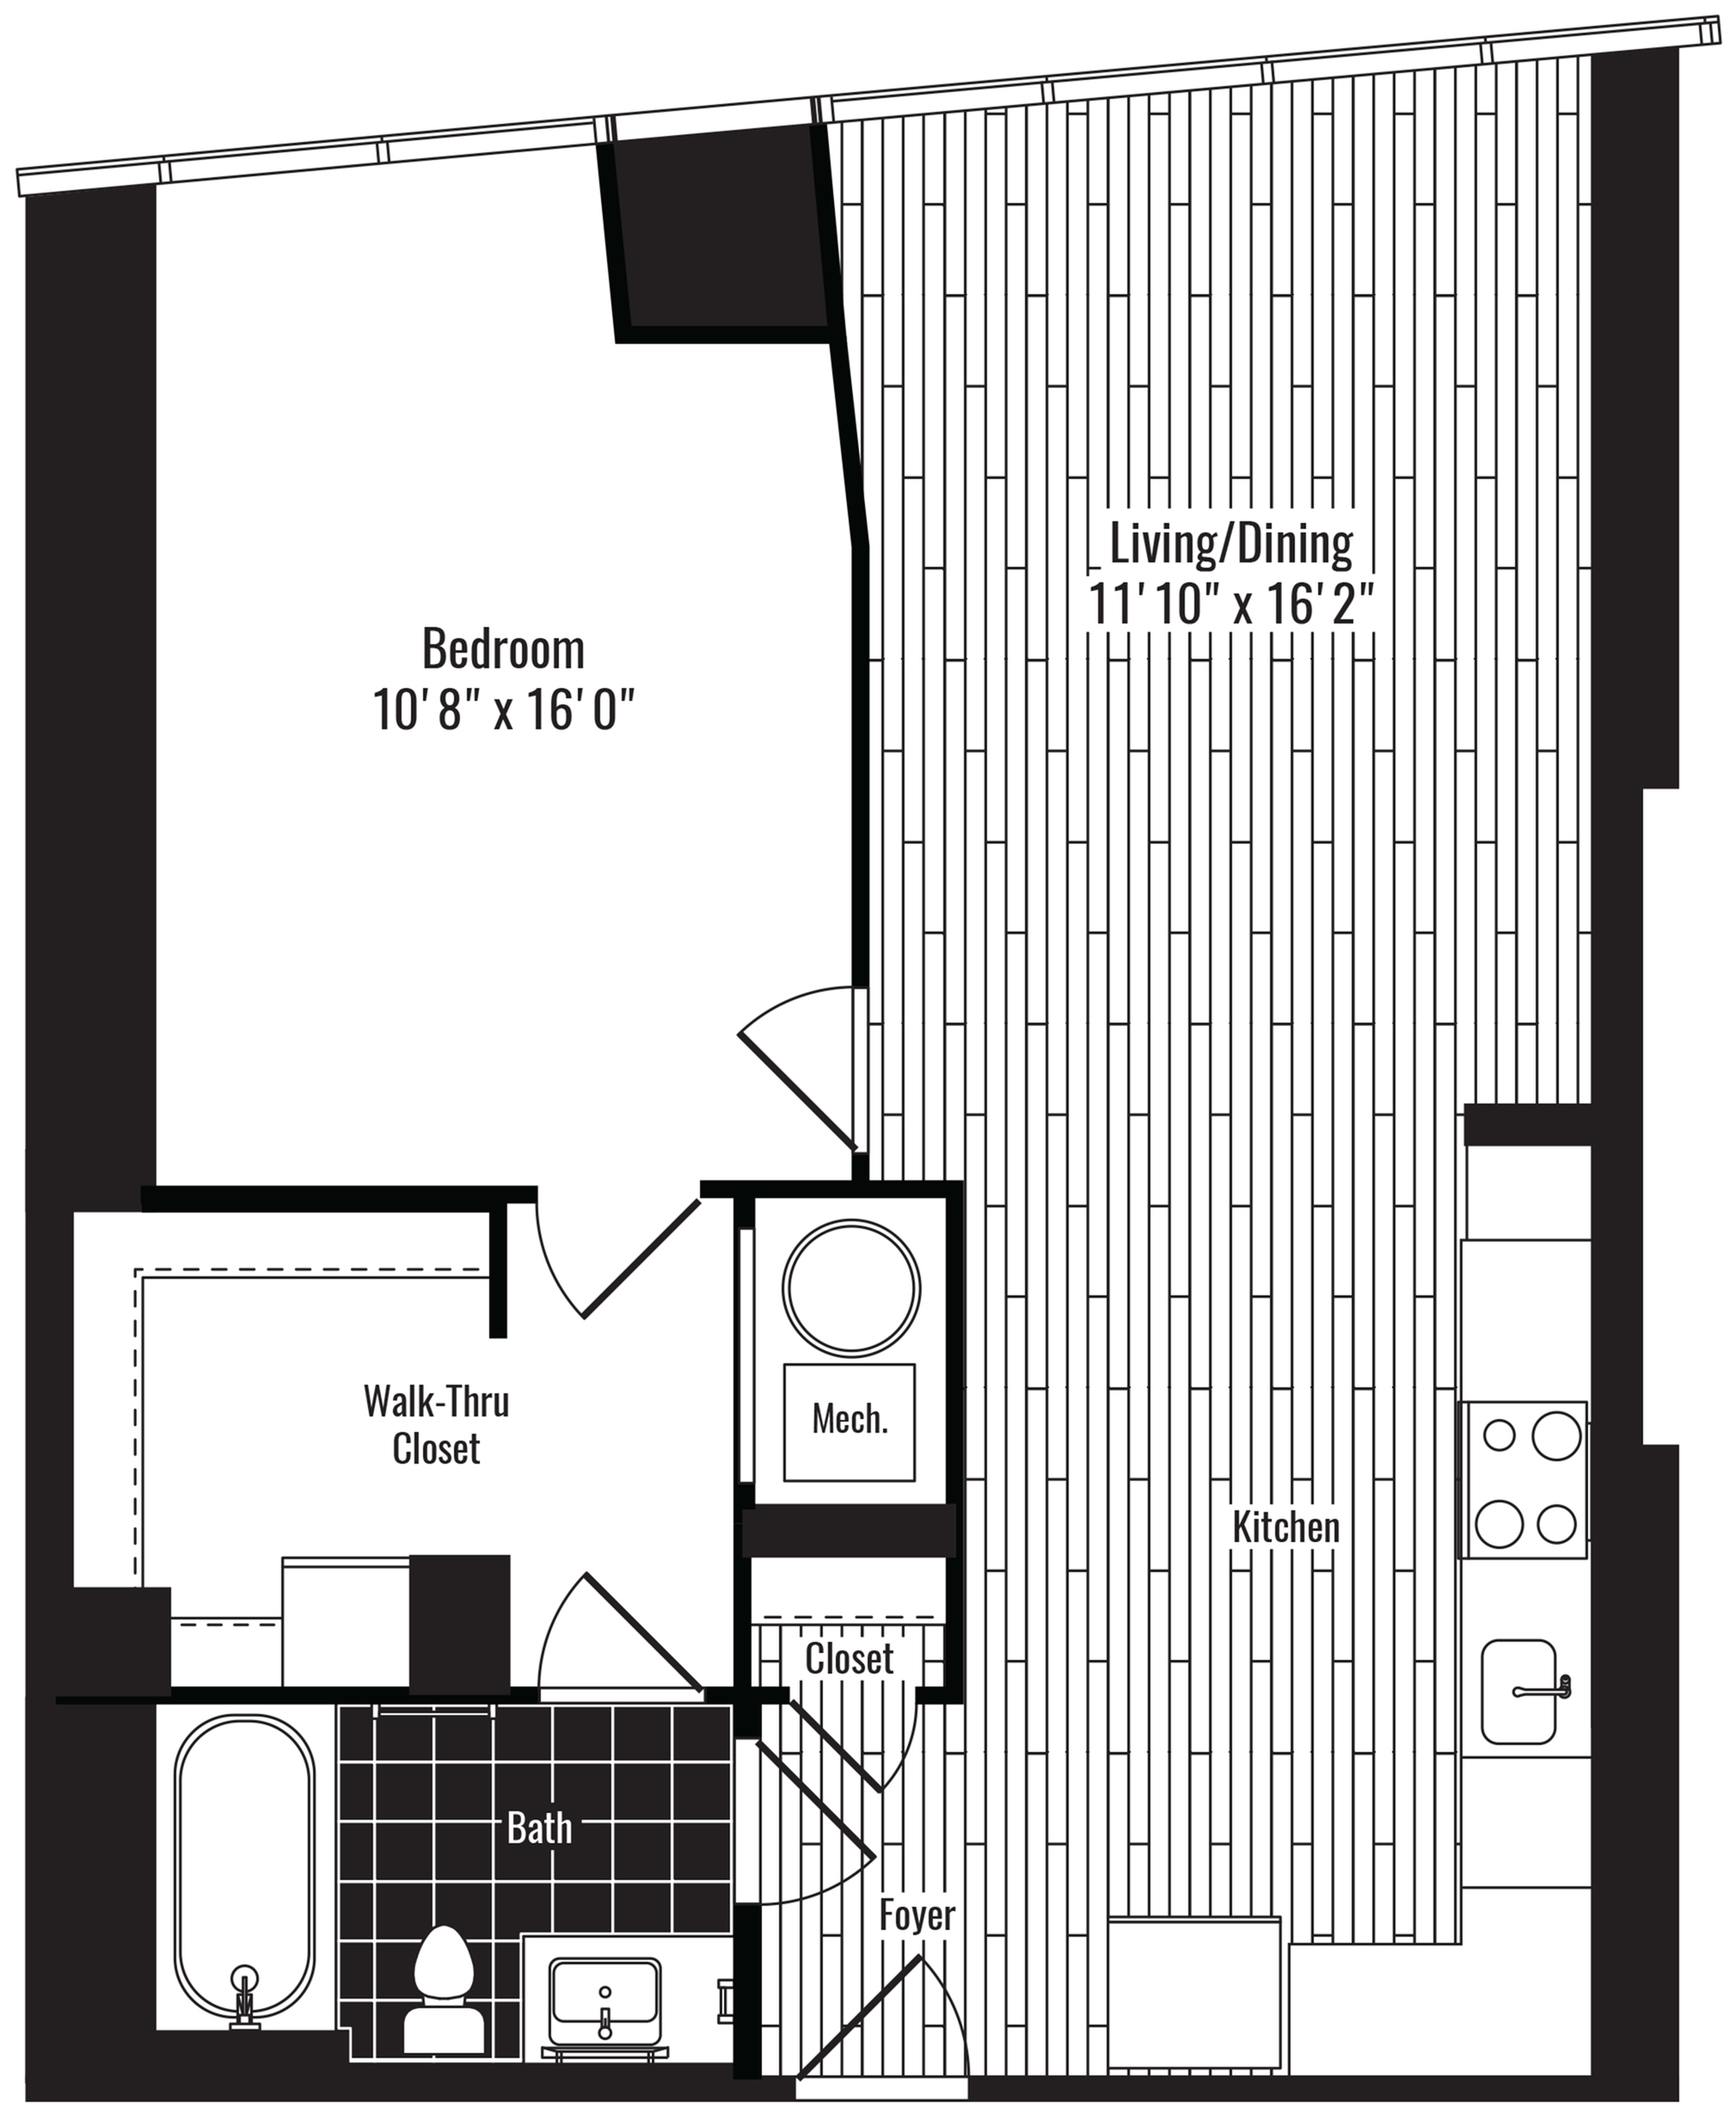 749 square foot one bedroom one bath apartment floorplan image